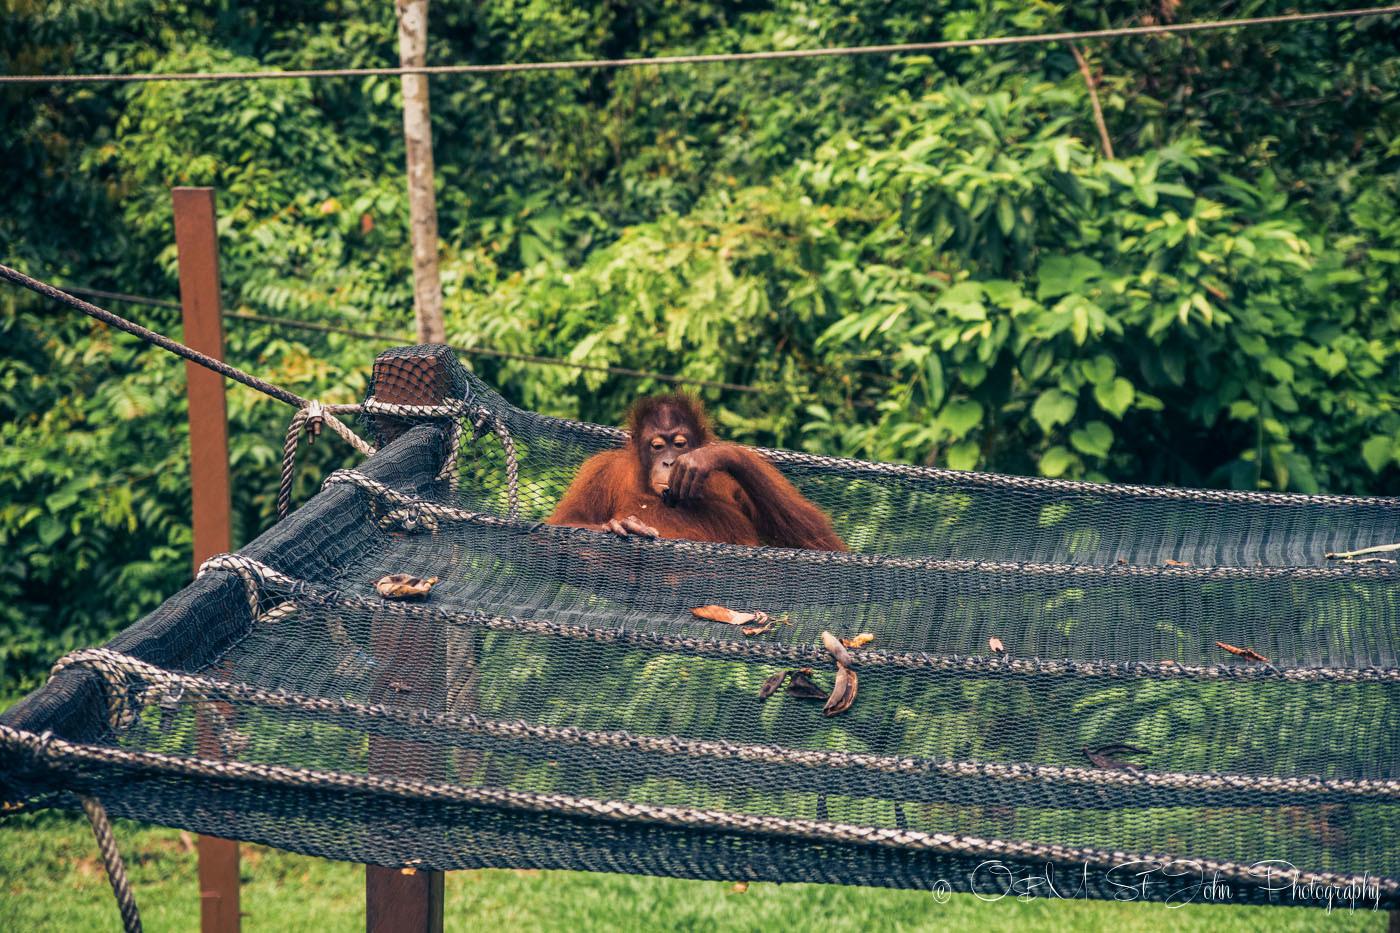 The elusive Borneo Orangutan